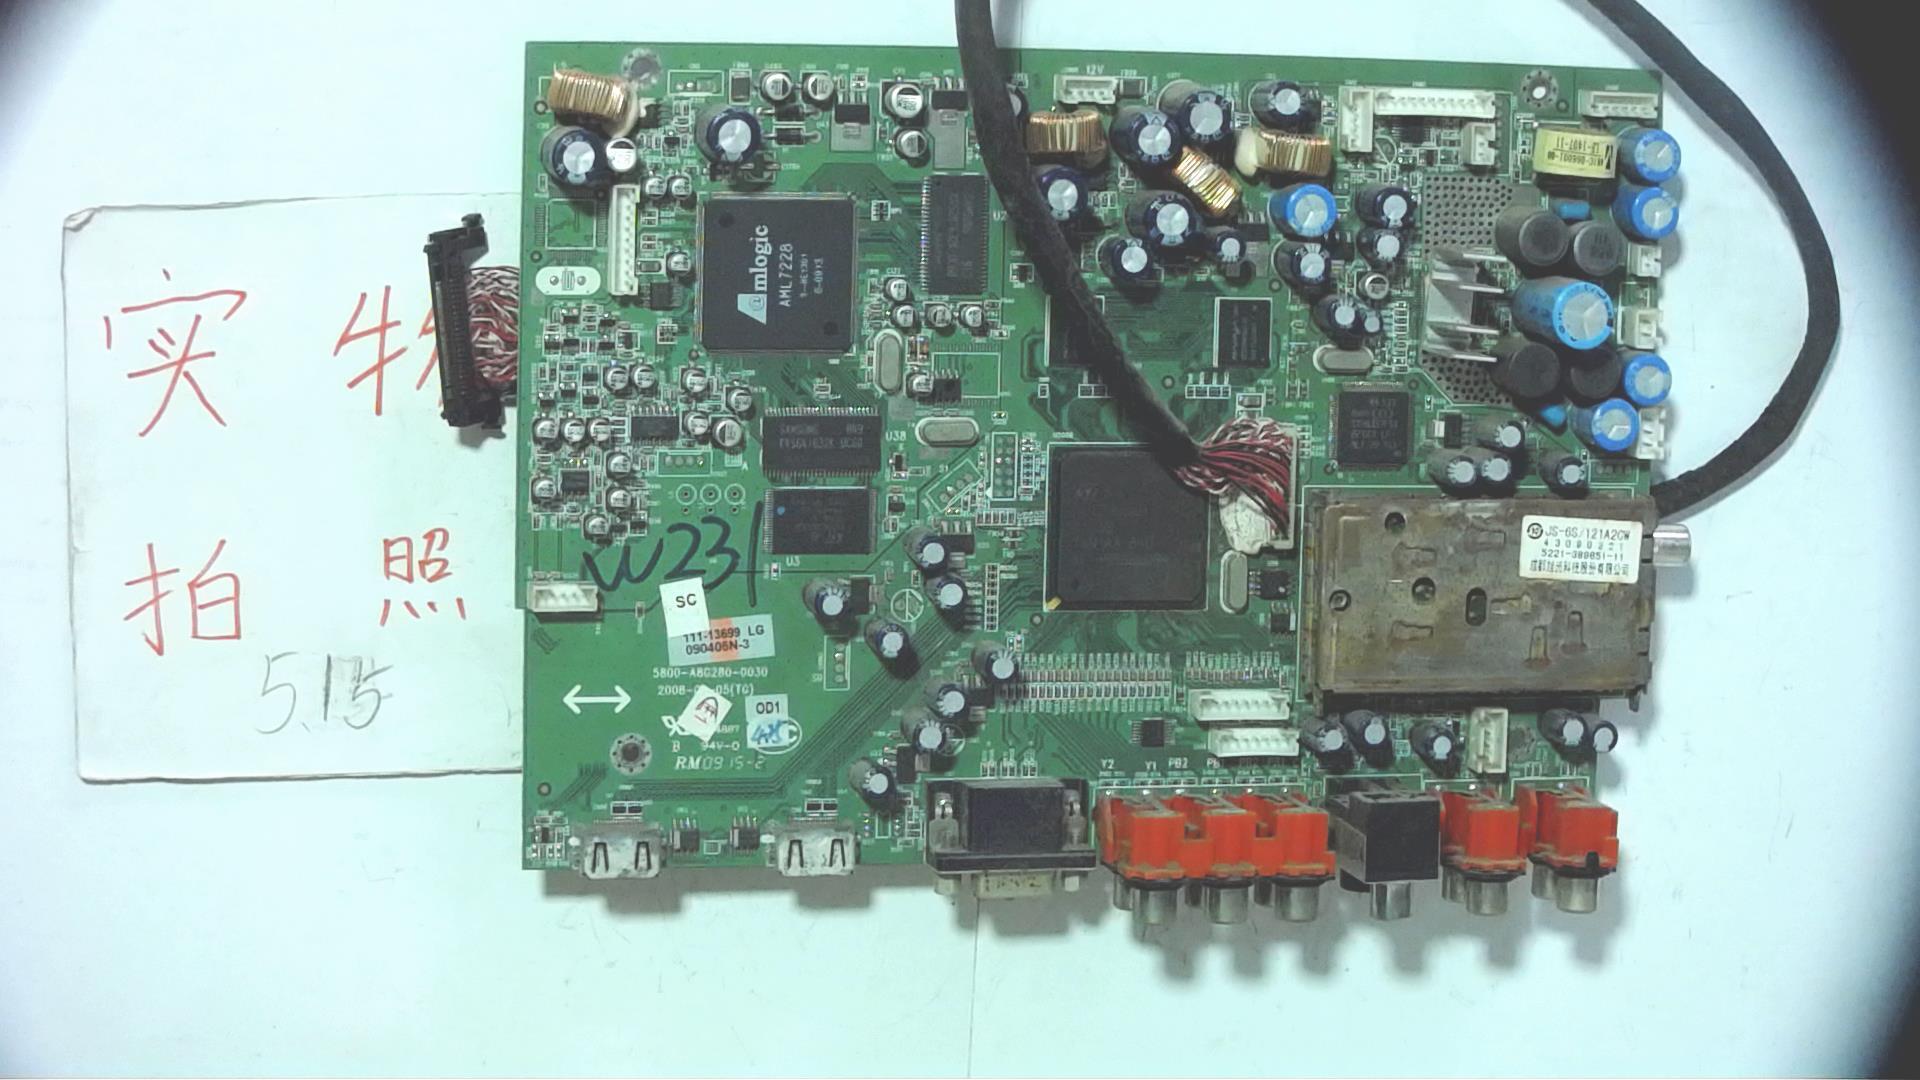 原装创维47L02RF主板5800-A8G280-0030屏LC470WUN(SB)(C2)